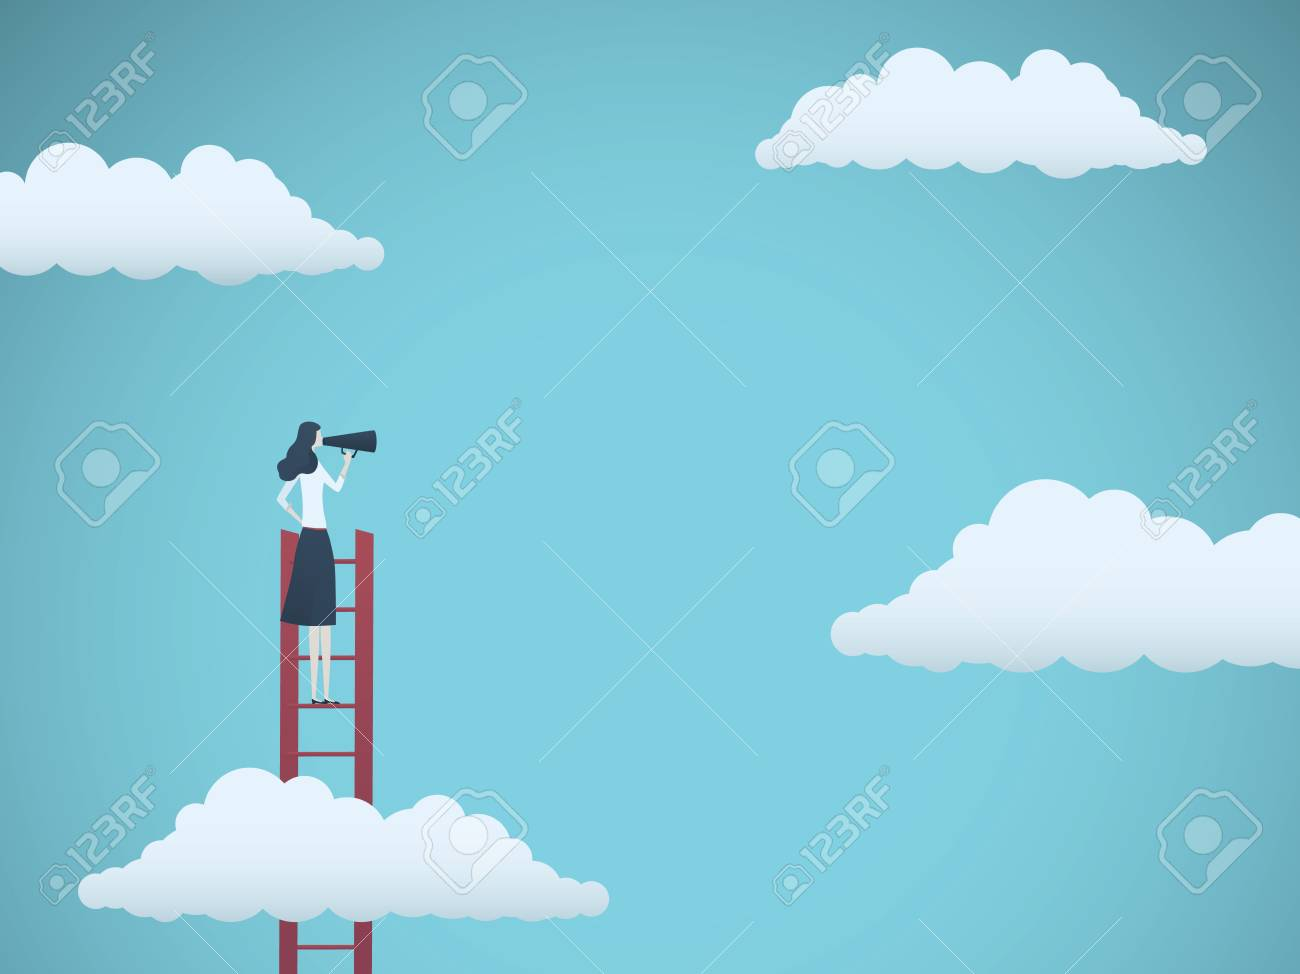 Public speaker or business leader vector concept. Businesswoman speaking through megaphone on a ladder. Symbol of motivation, challenge, ambition. Eps10 vector illustration. - 107359157